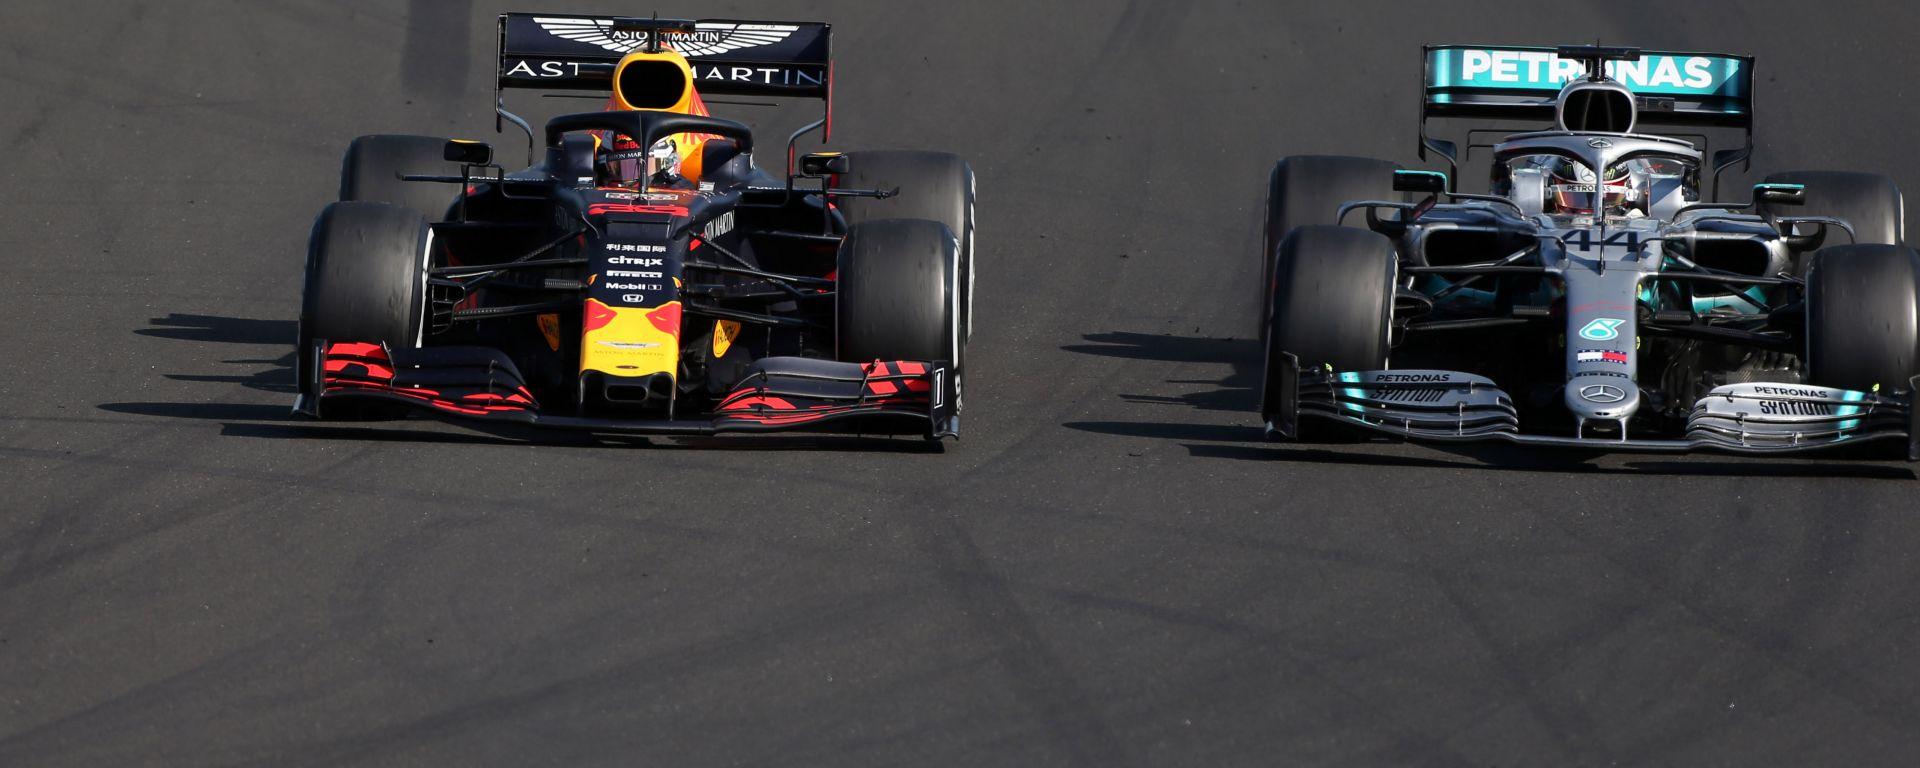 F1 GP Ungheria 2019, Budapest: Lewis Hamilton (Mercedes) sorpassa Max Verstappen (Red Bull)